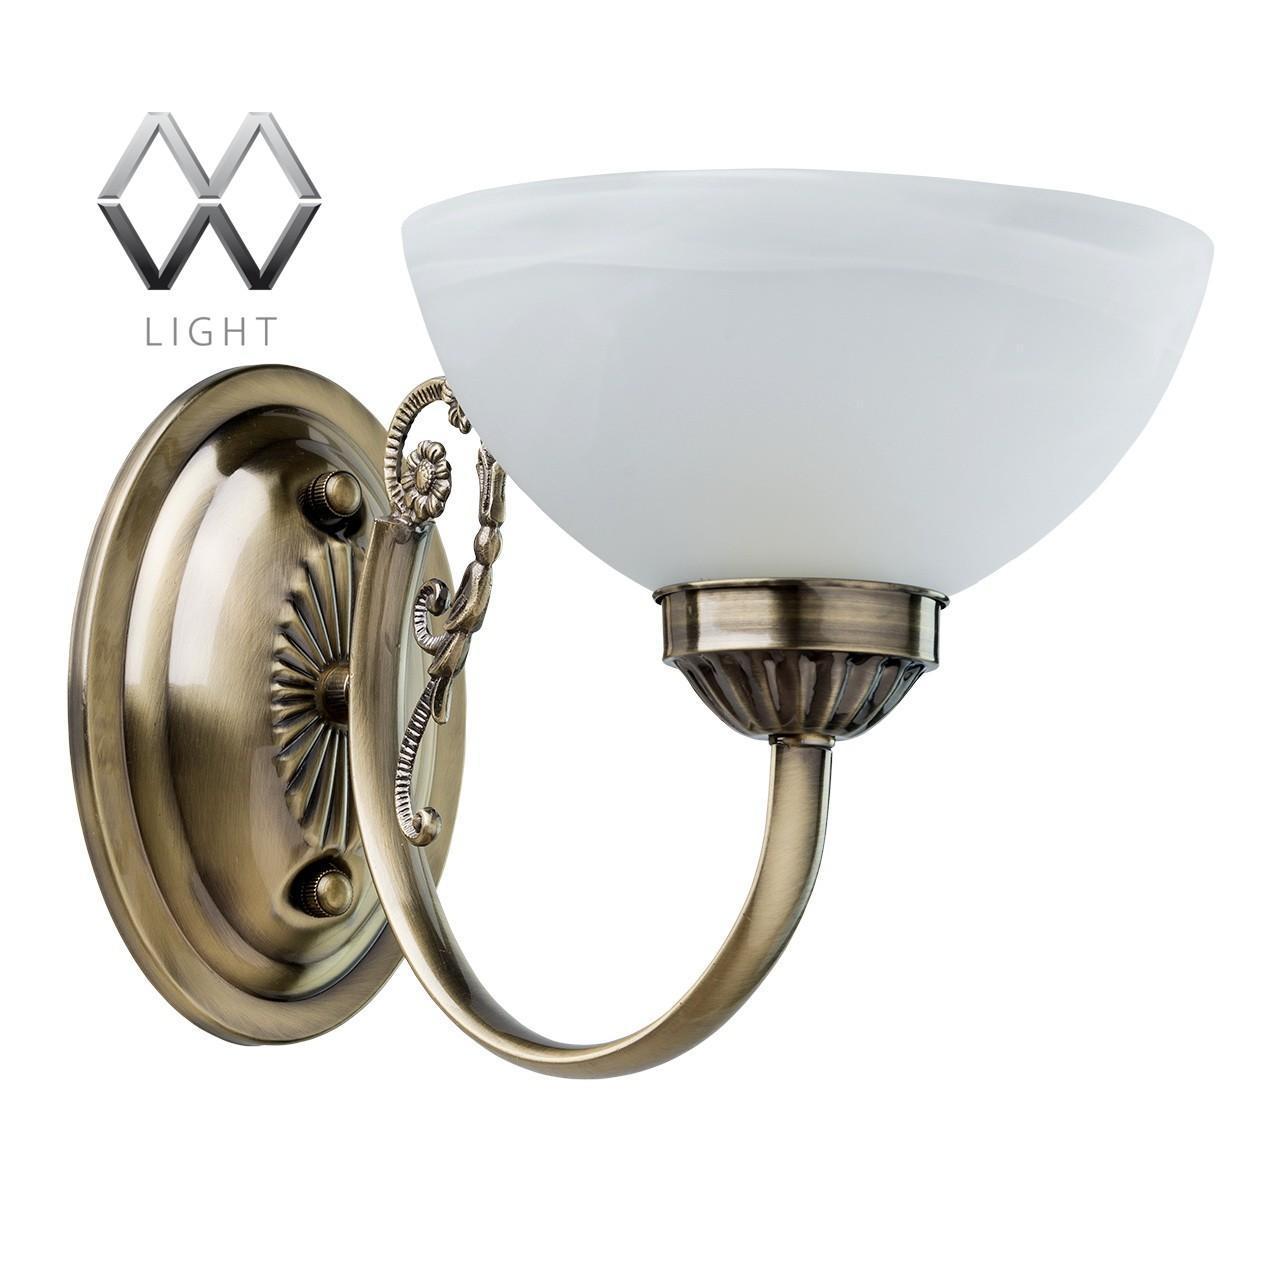 Бра MW-Light Олимп 318024201 бра mw light олимп 5 318024301